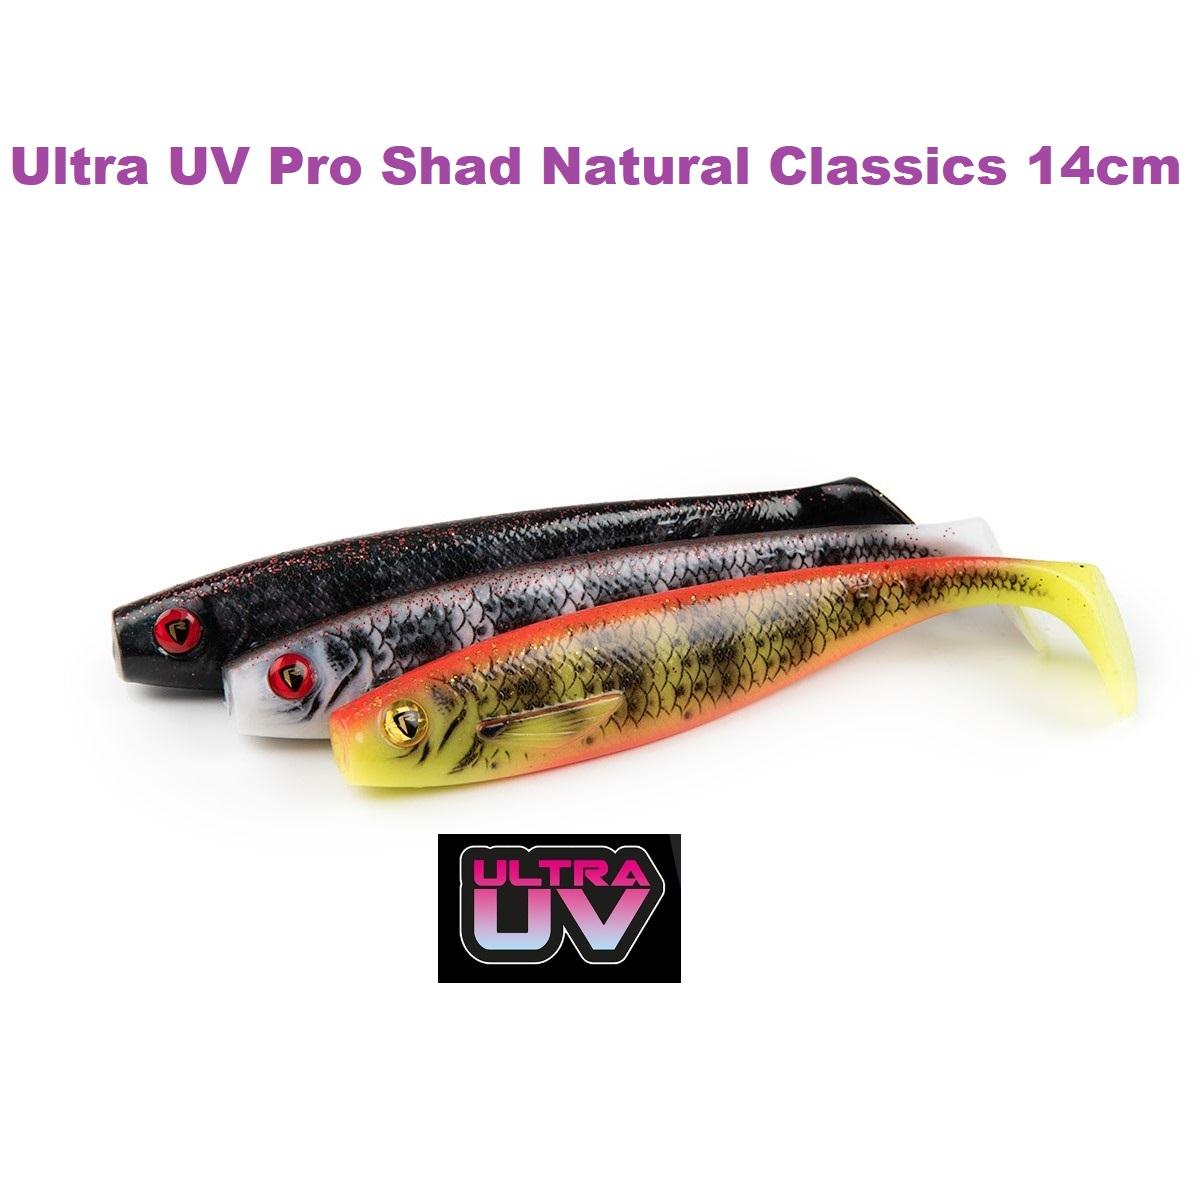 Fox Rage Ultra UV Pro Shad Natural Classics 14cm